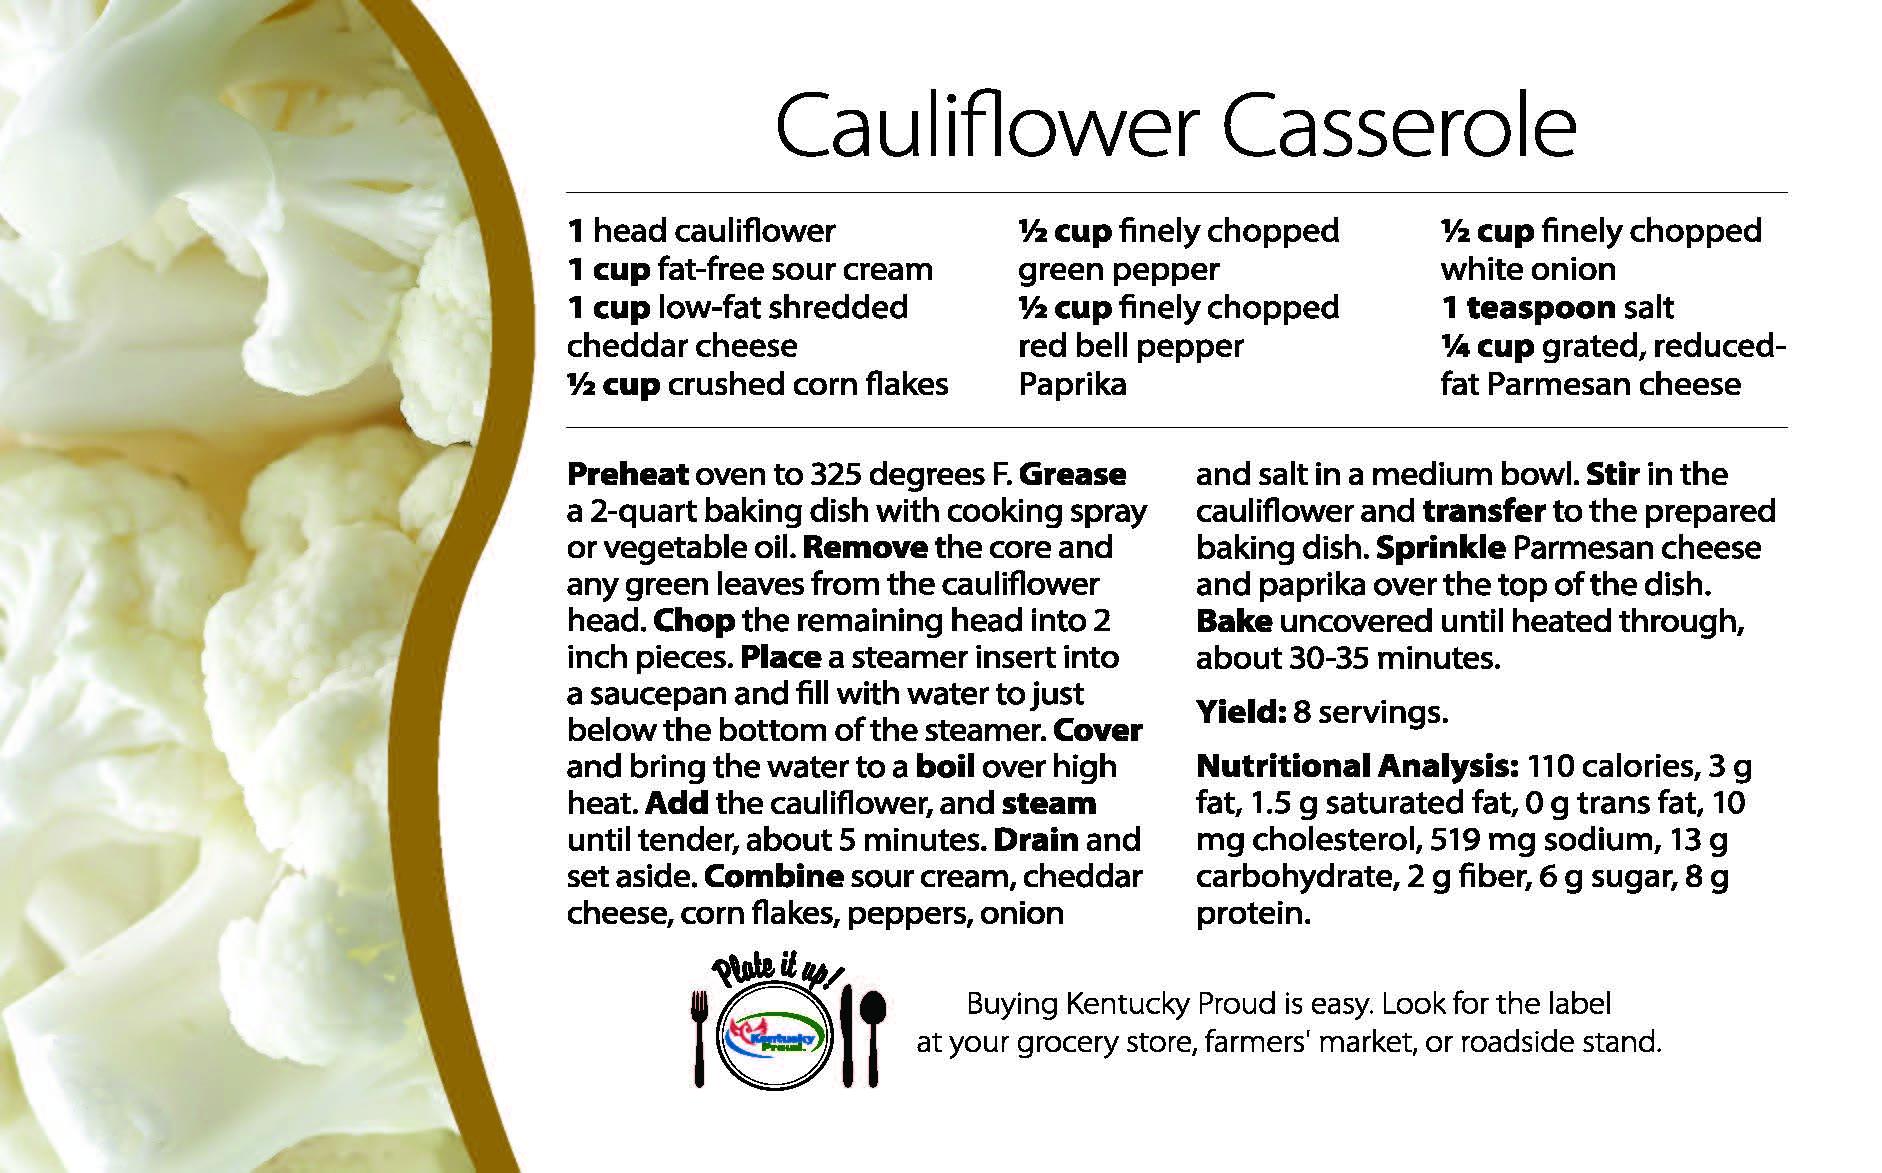 Cauliflower-Casserole-card_Page_1